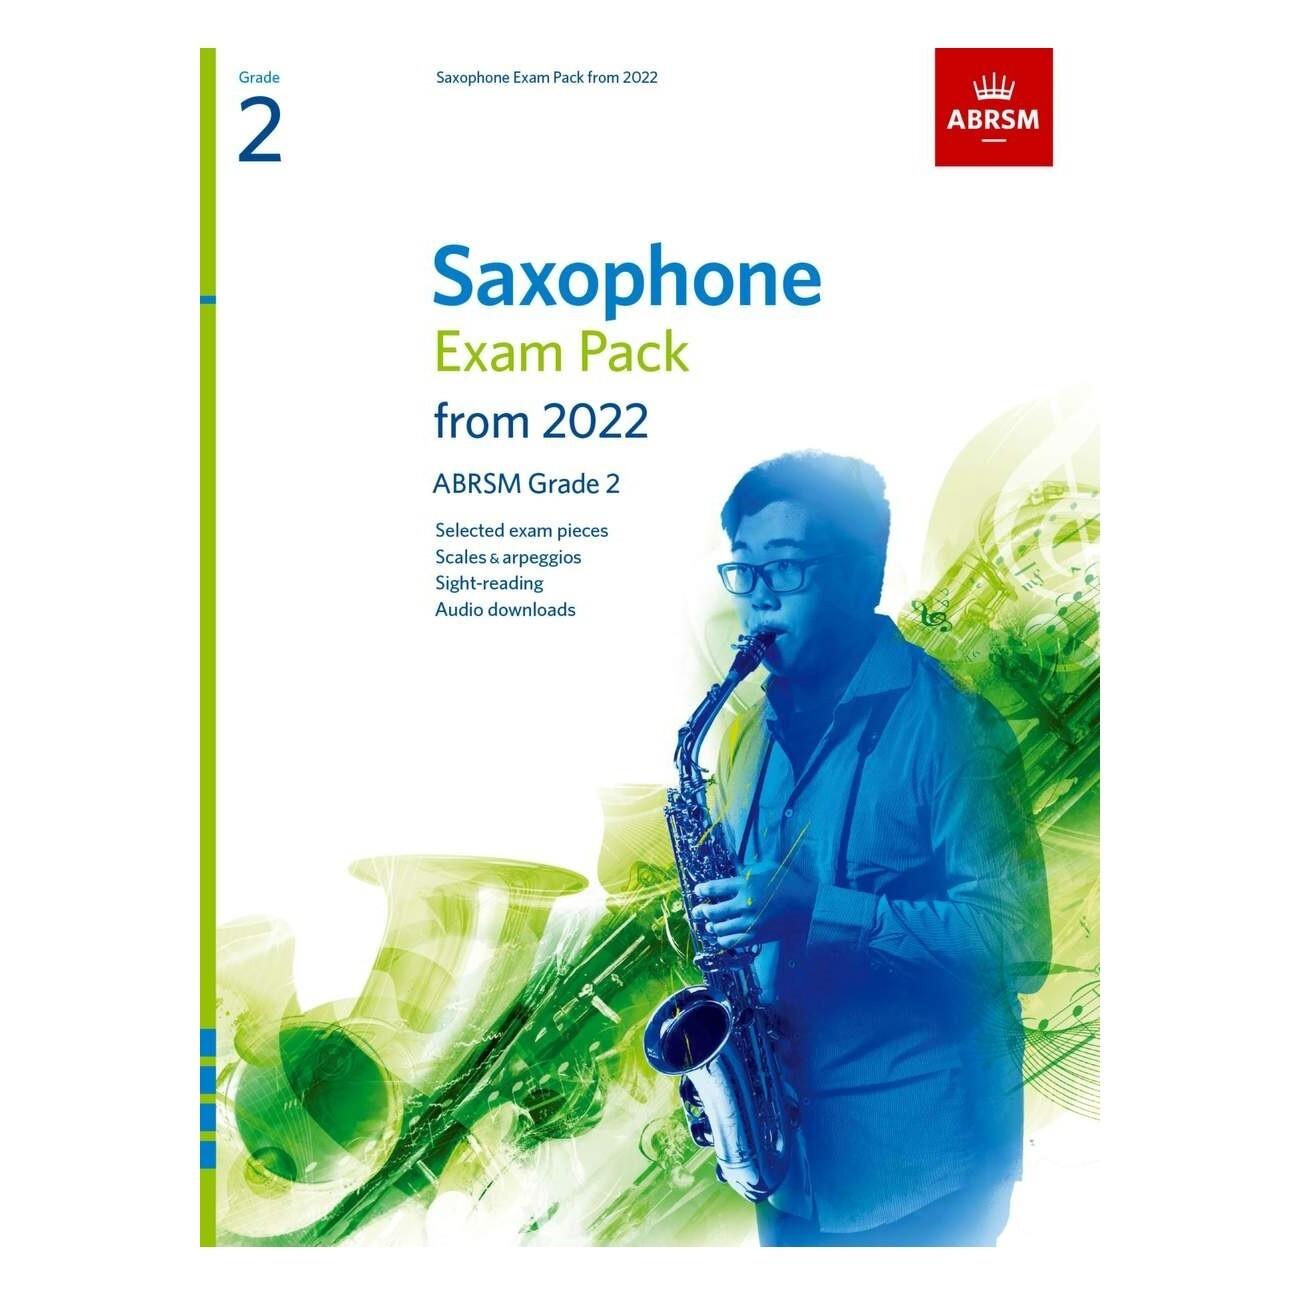 ABRSM Saxophone Exam Pack Grade 2 2022-2025